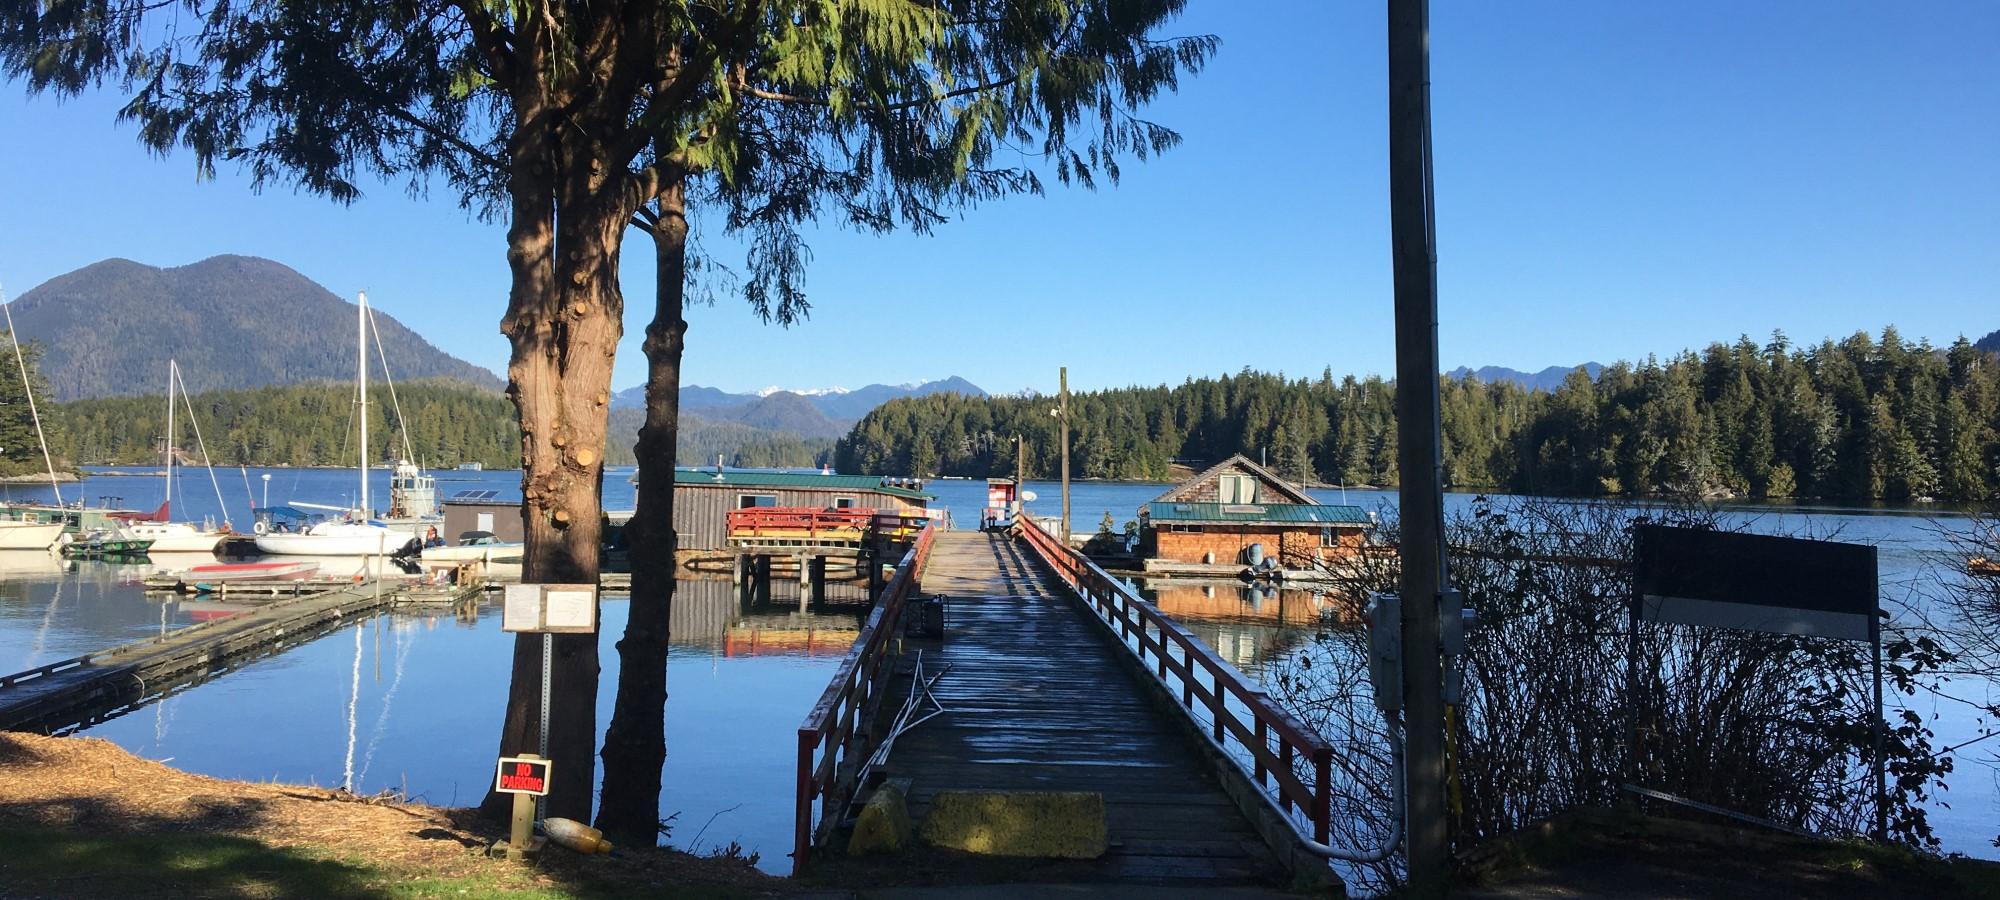 Hiking Meares Island, Tofino, British Columbia